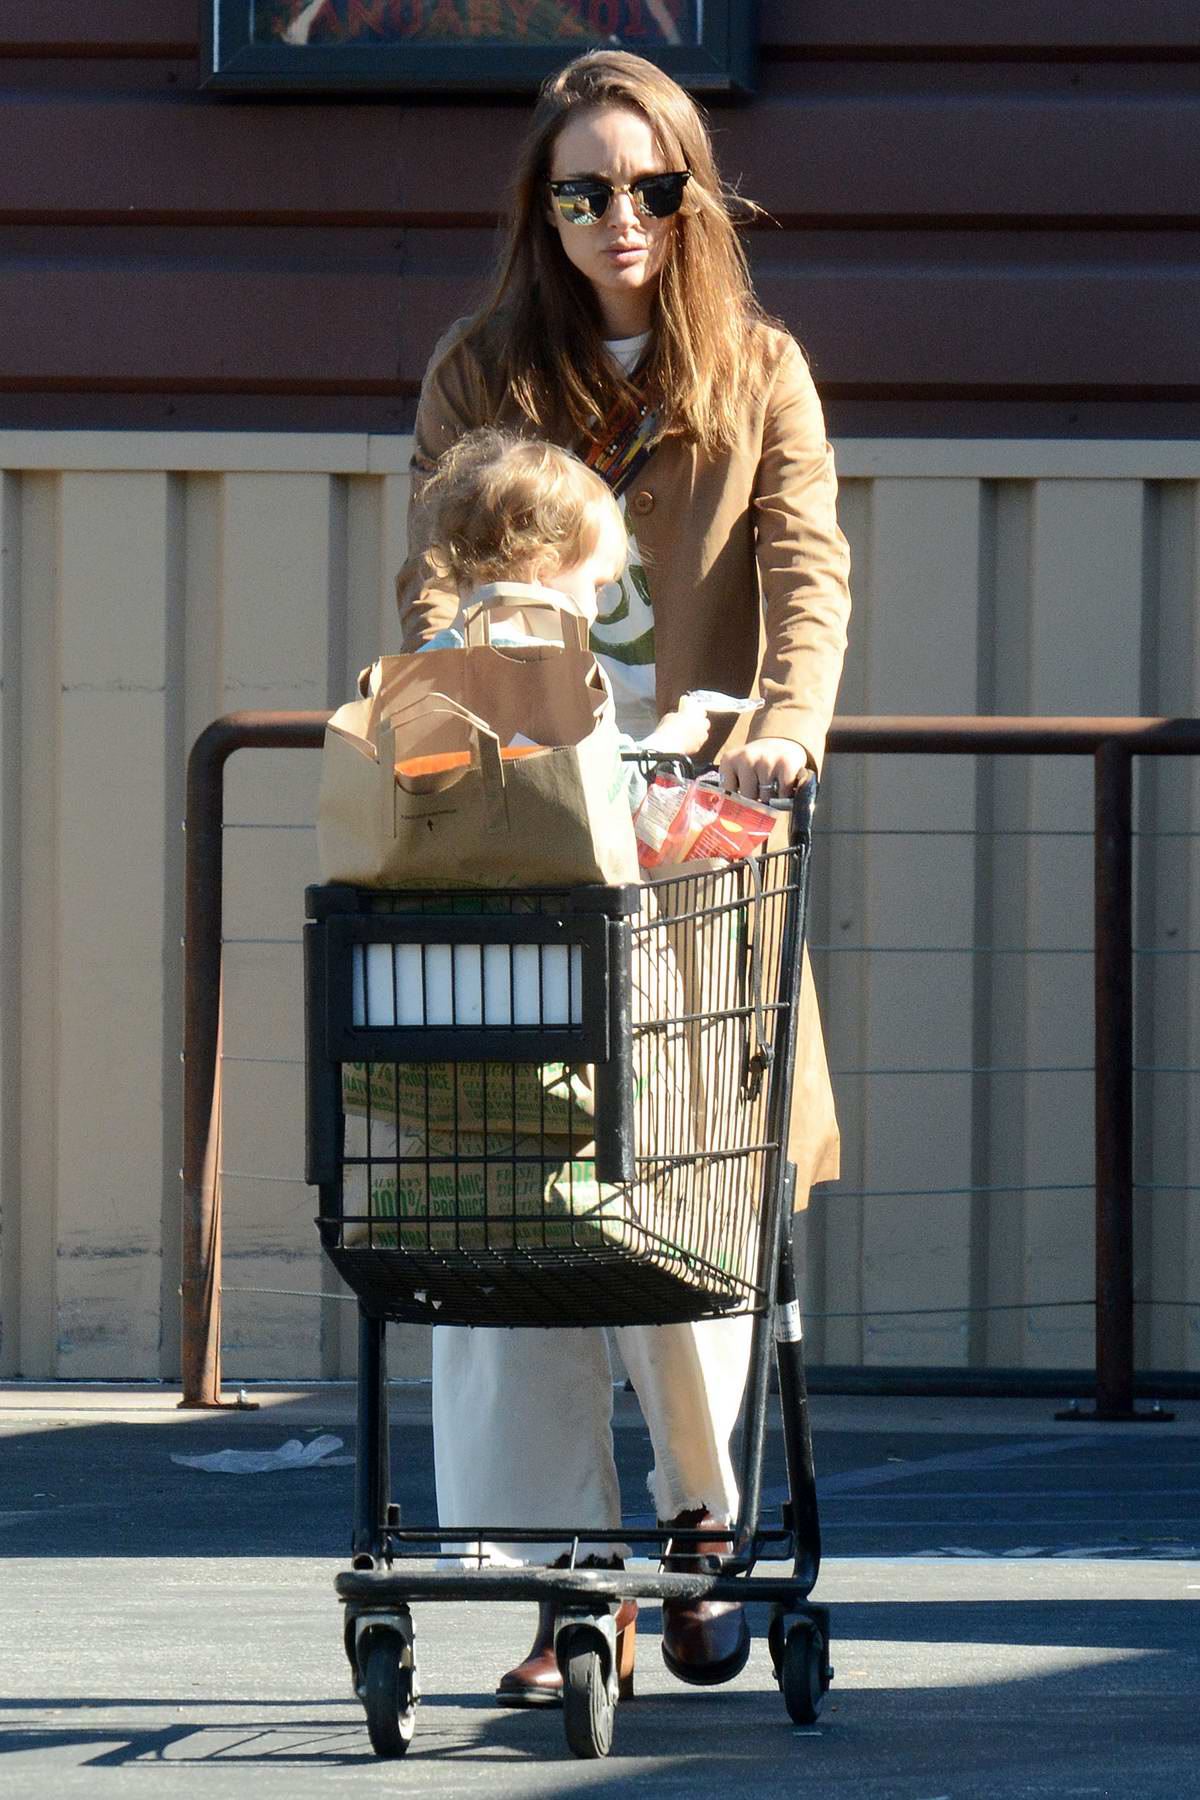 Natalie Portman and daughter leaving Lassen's Natural Foods in Los Angeles